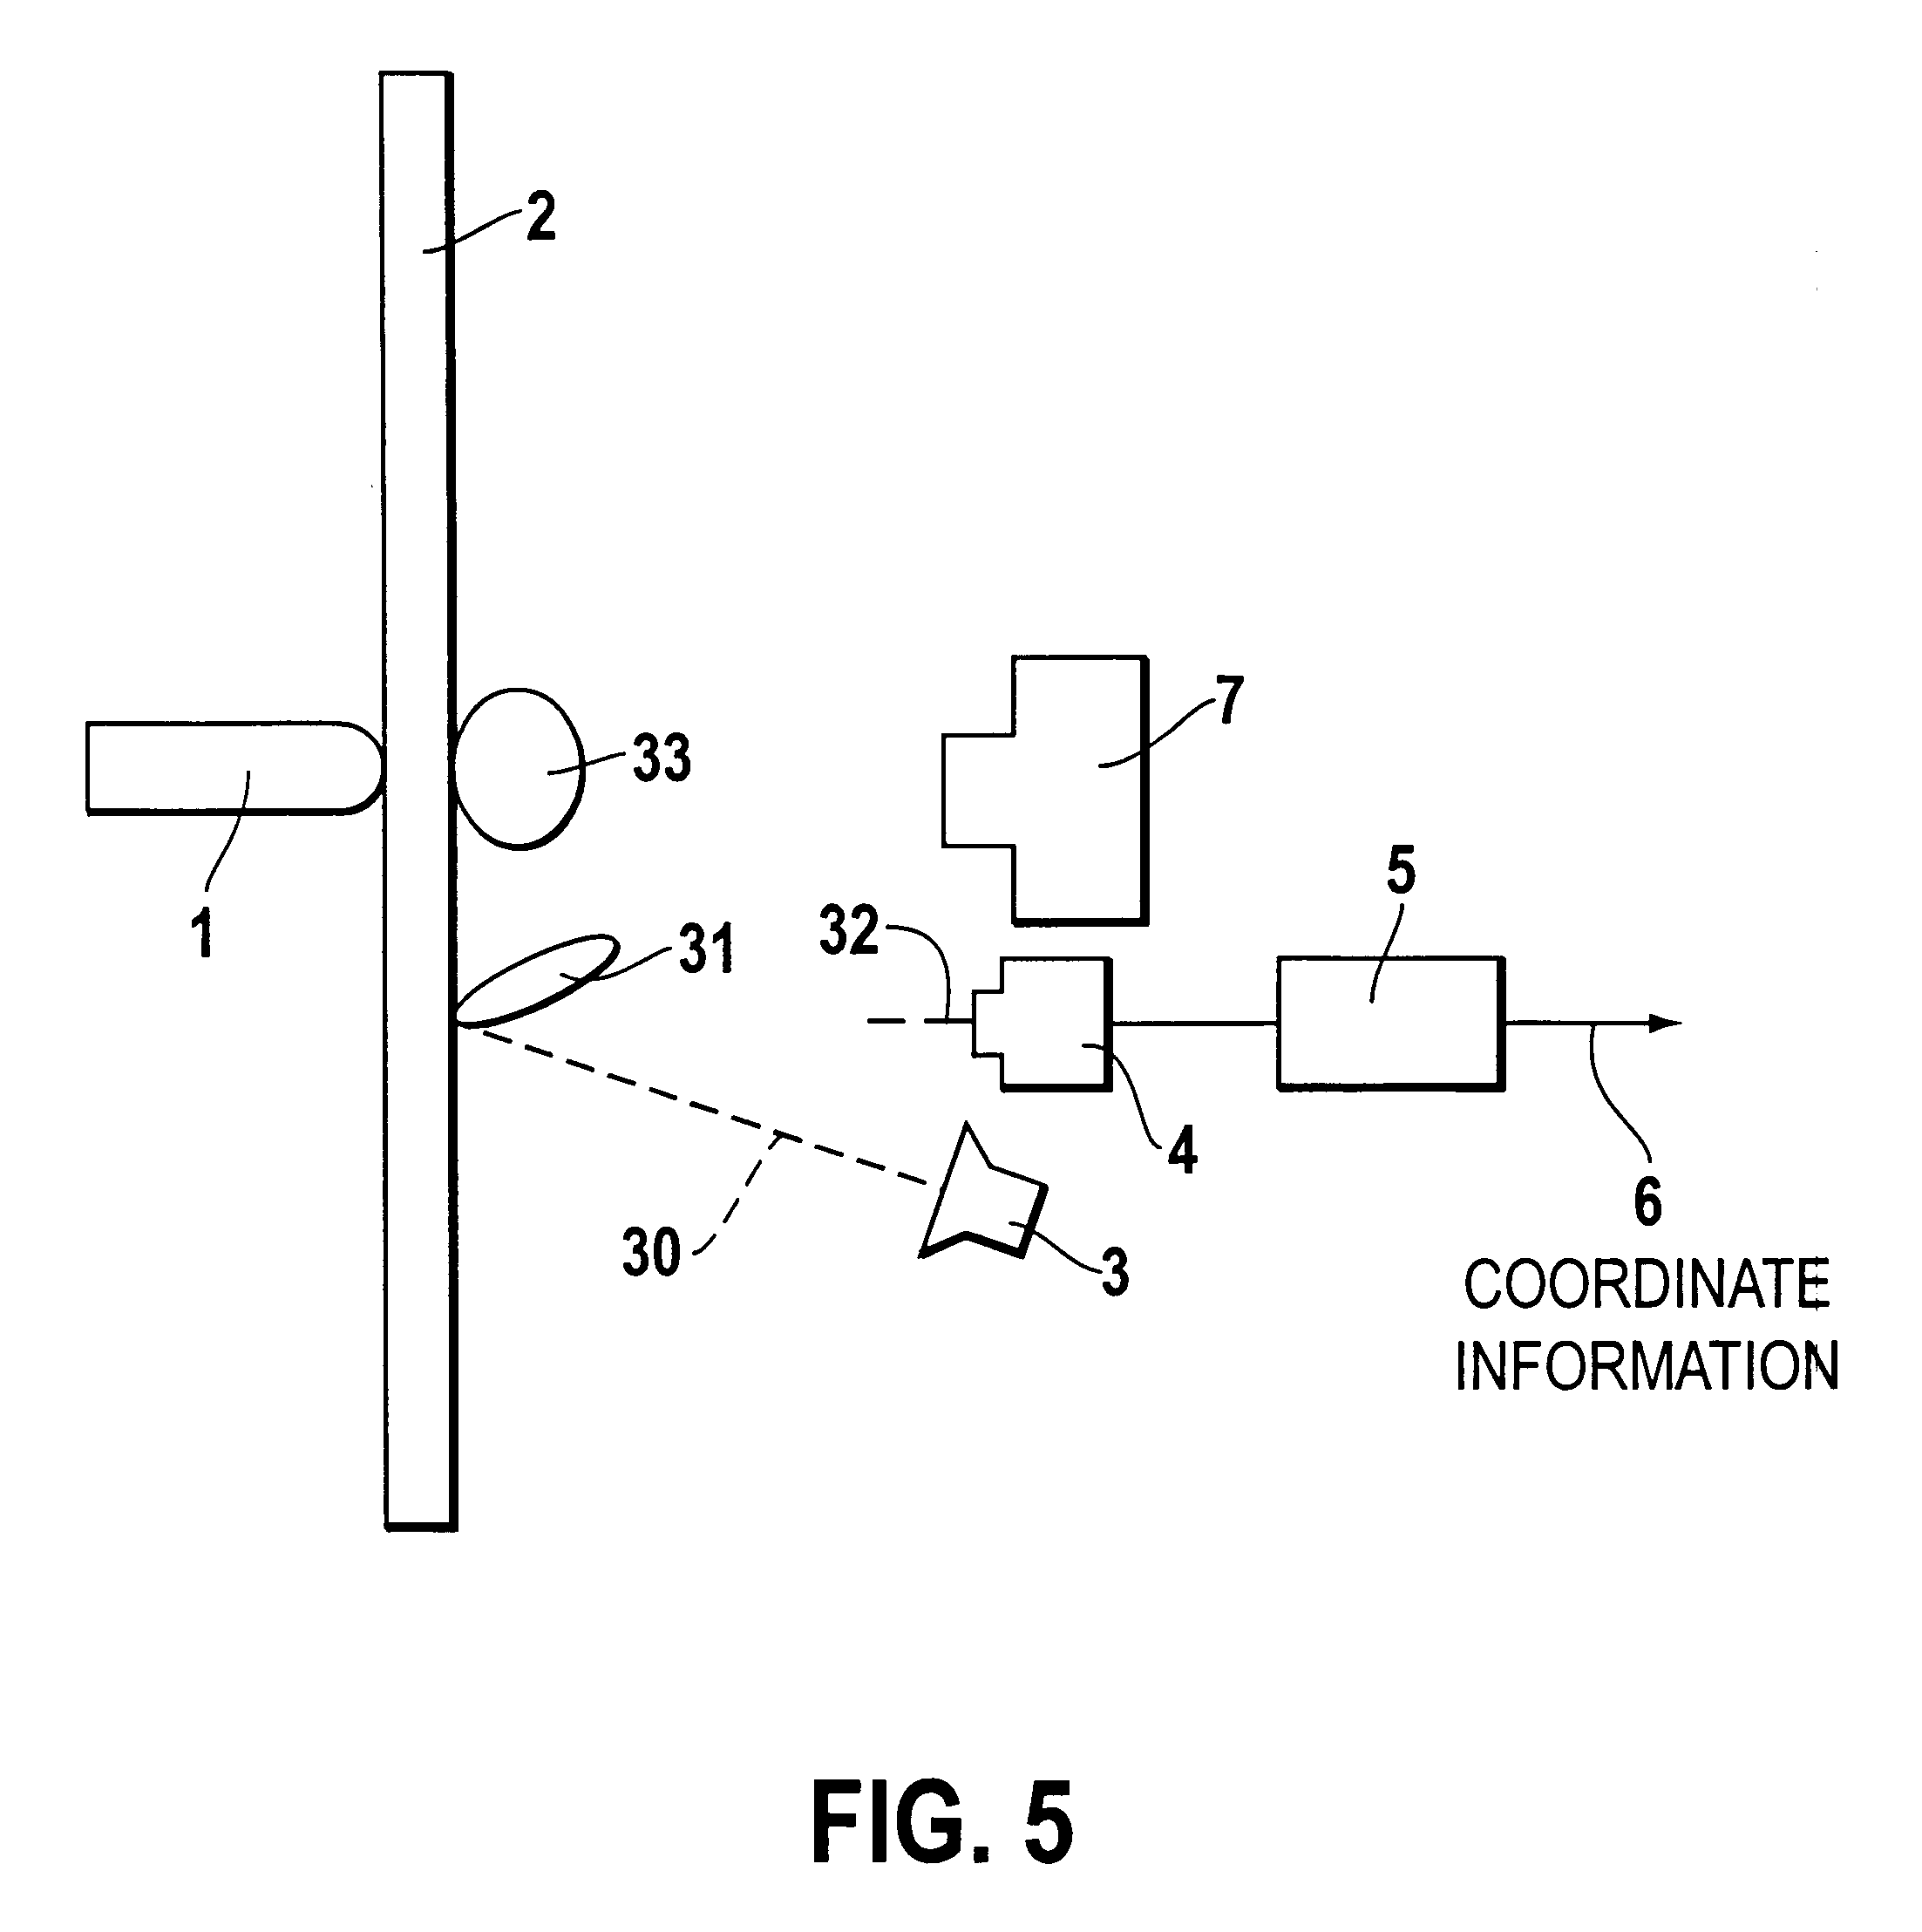 wiringpi input coordinates